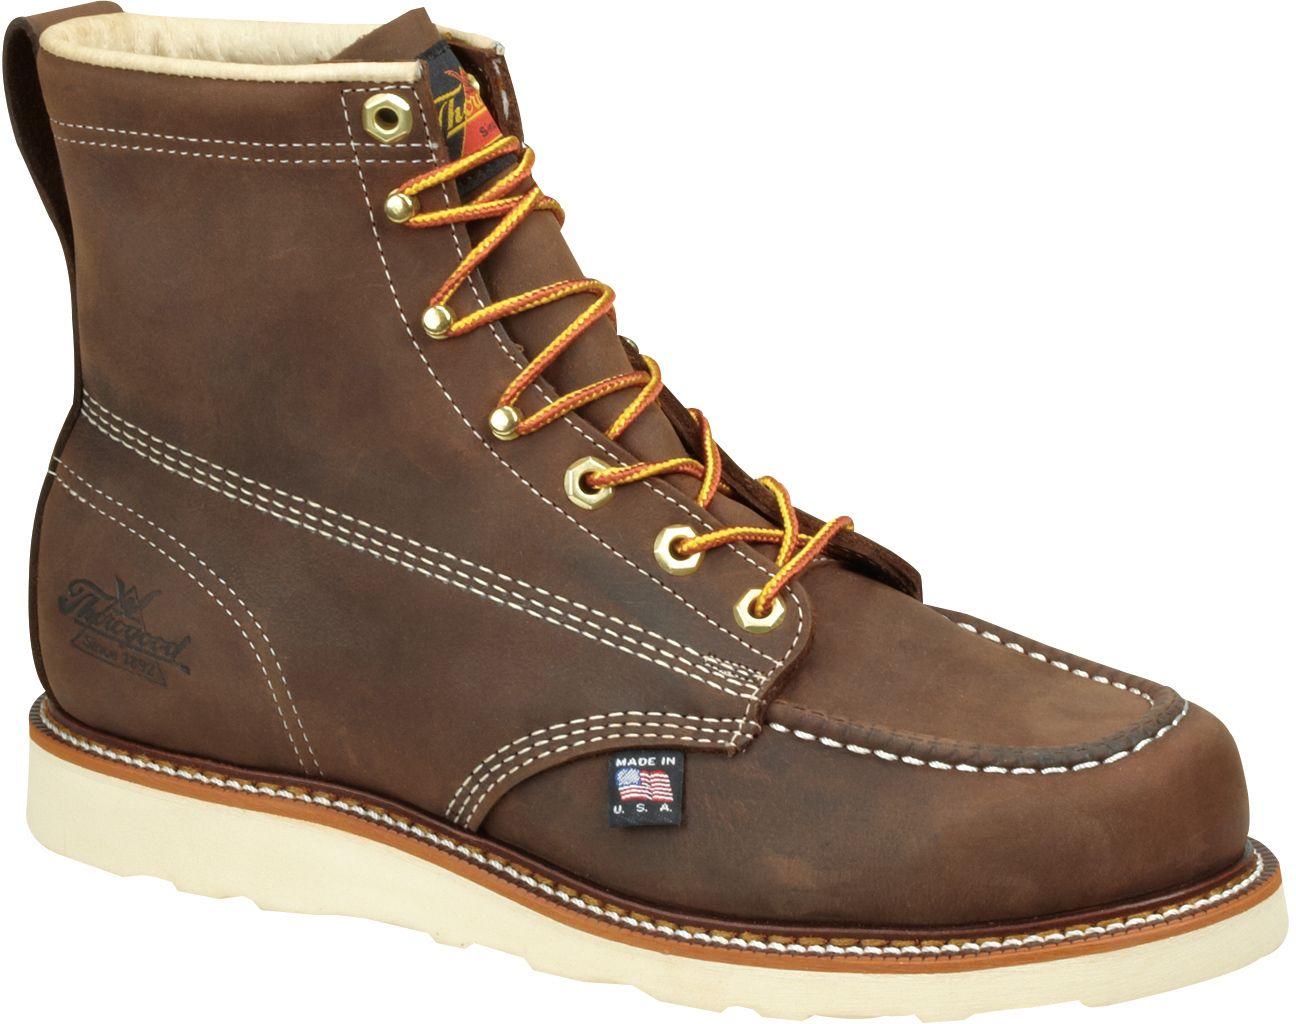 8144203 Thorogood Men's SR Work Boots Brown Good work